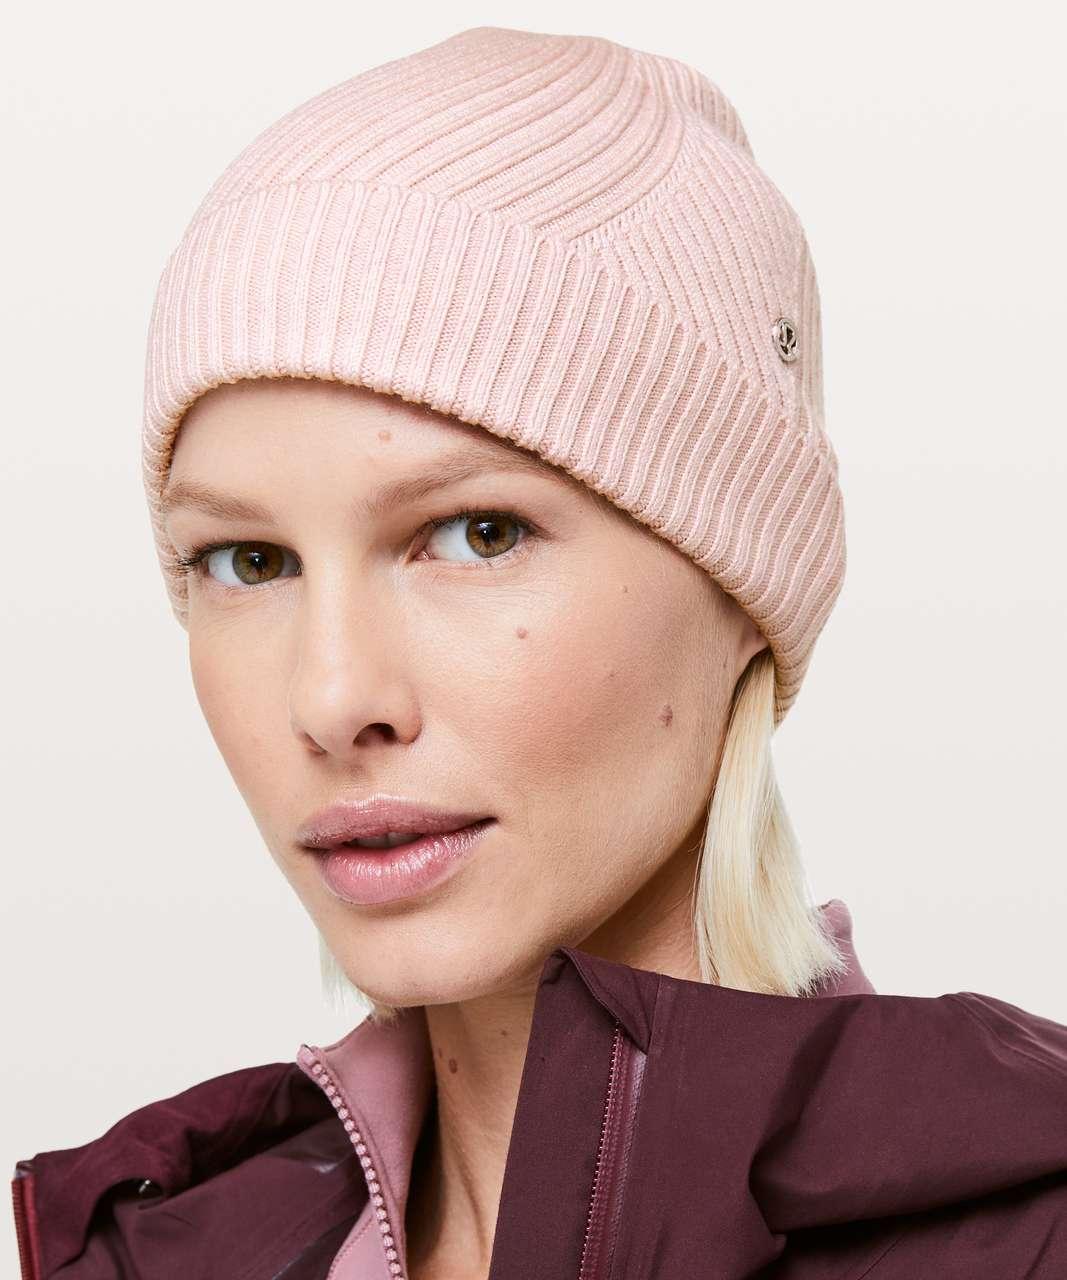 6756bce8cd684 Lululemon Twist Of Cozy Knit Beanie - Heathered Rose Tea - lulu fanatics